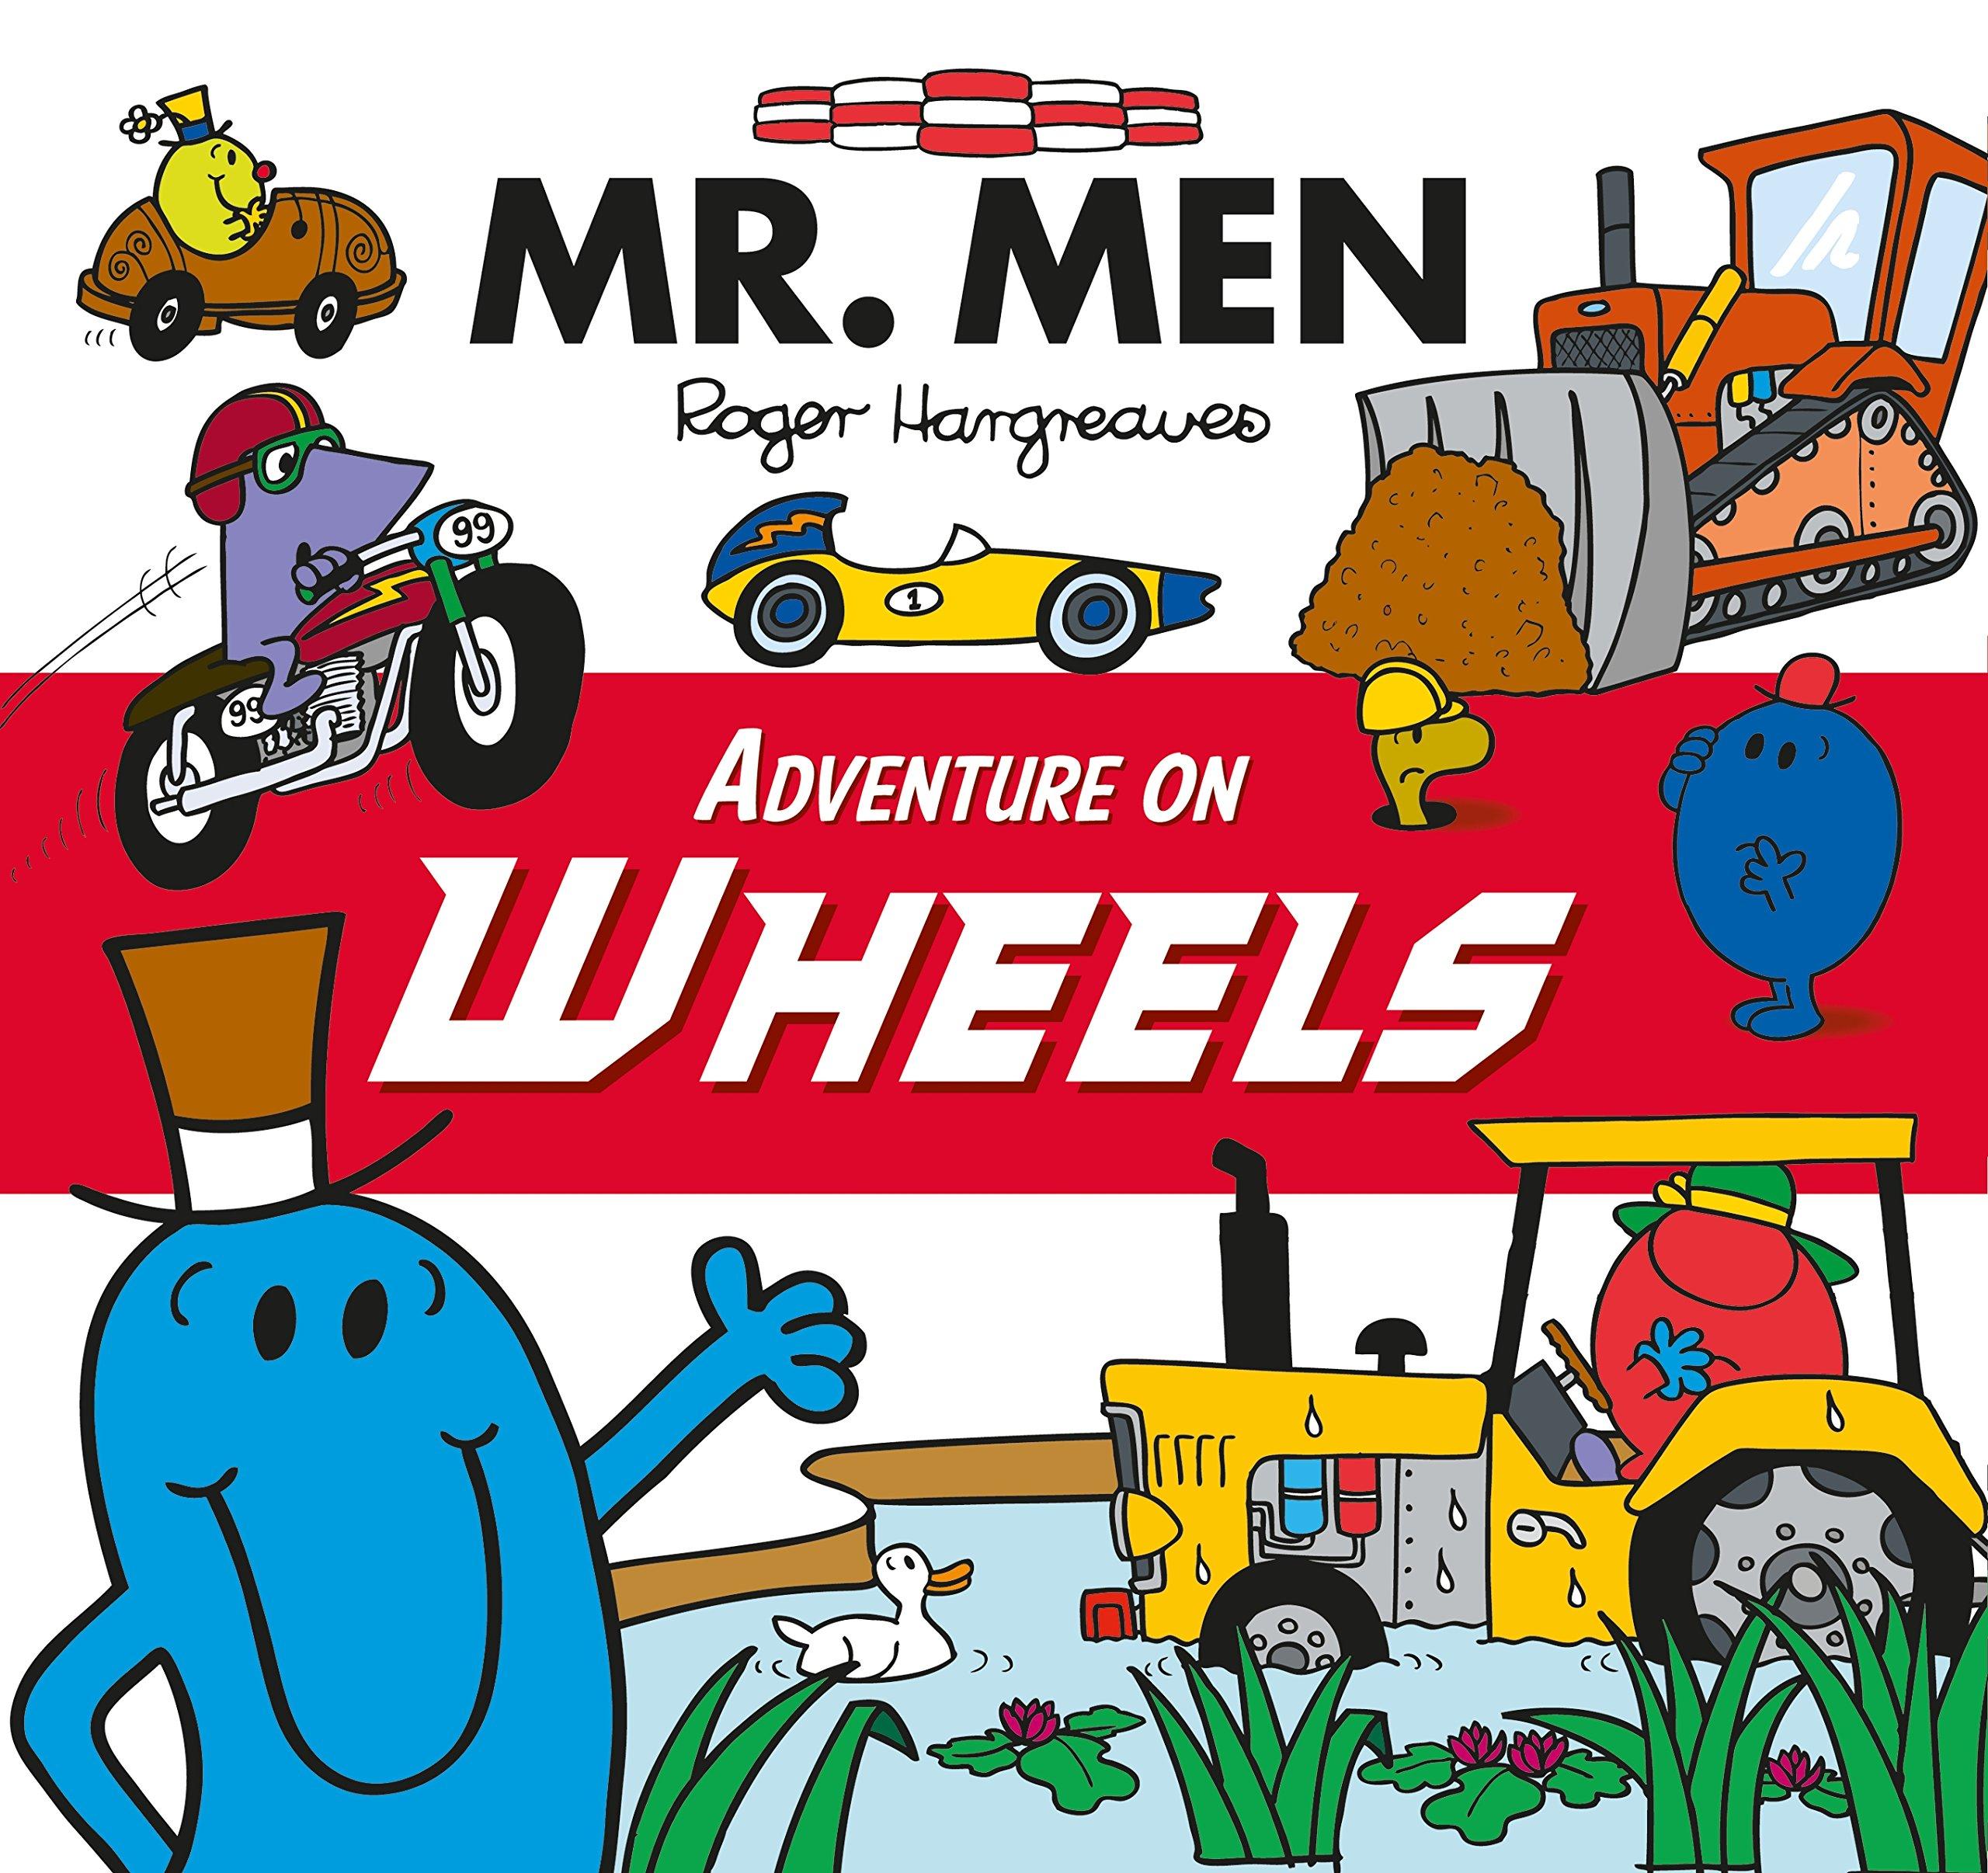 Mr. Men - Adventure on Wheels